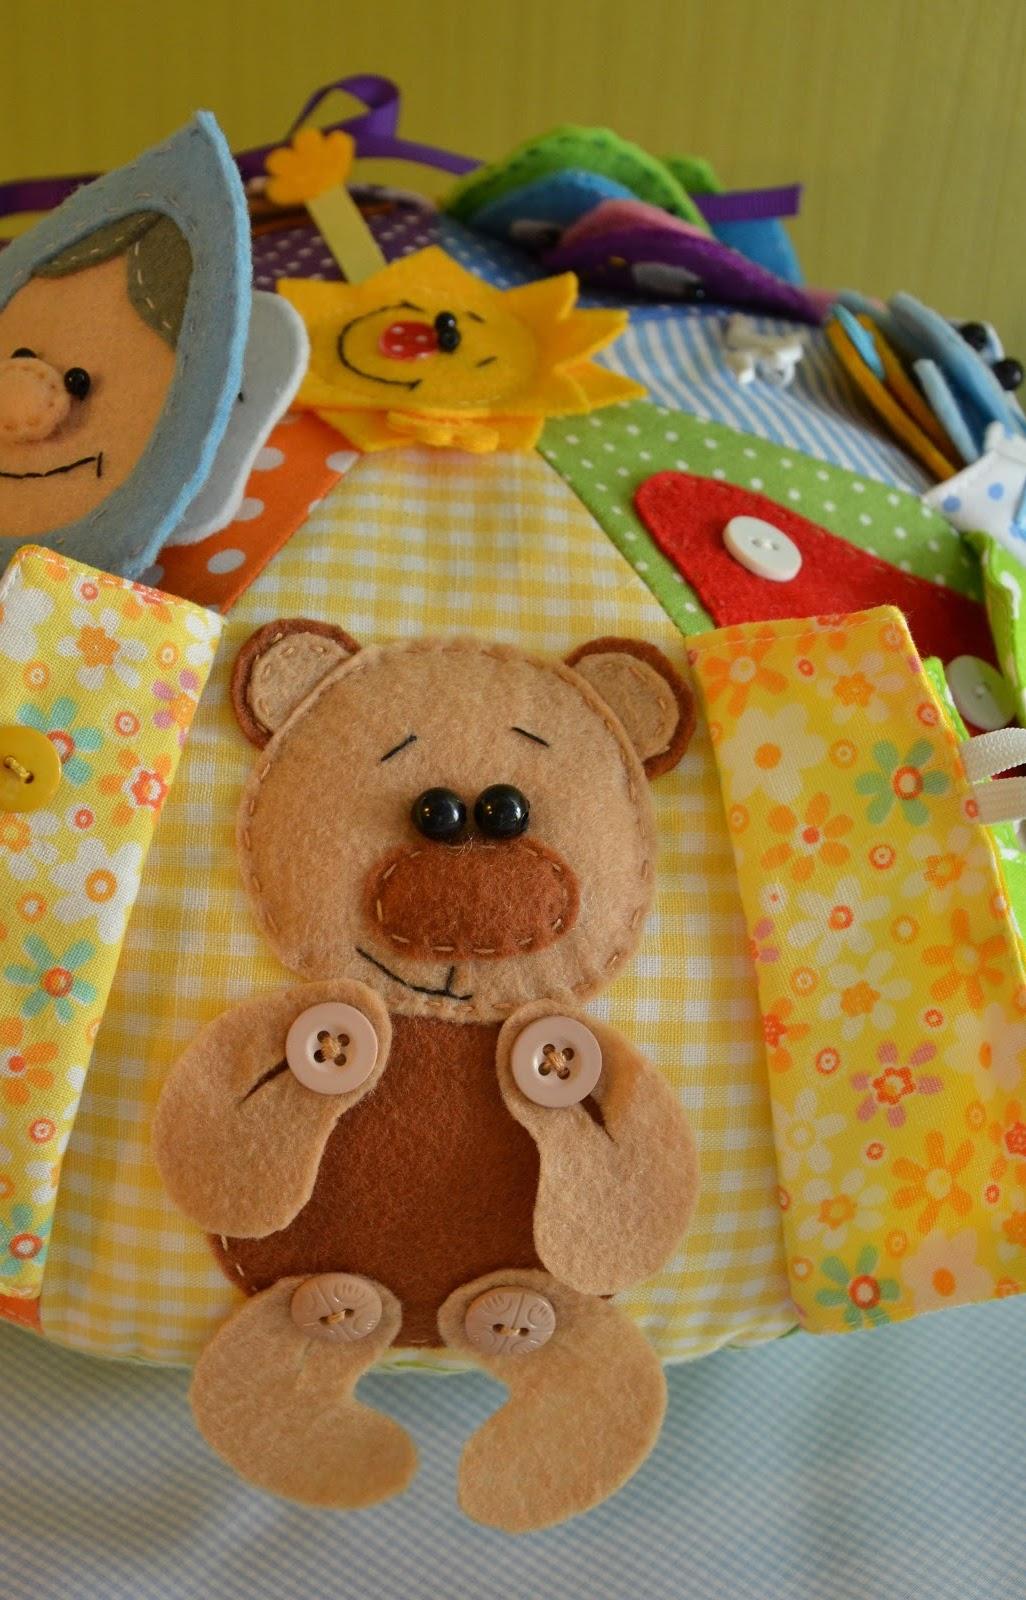 Развивающая подушка-игрушка своими руками